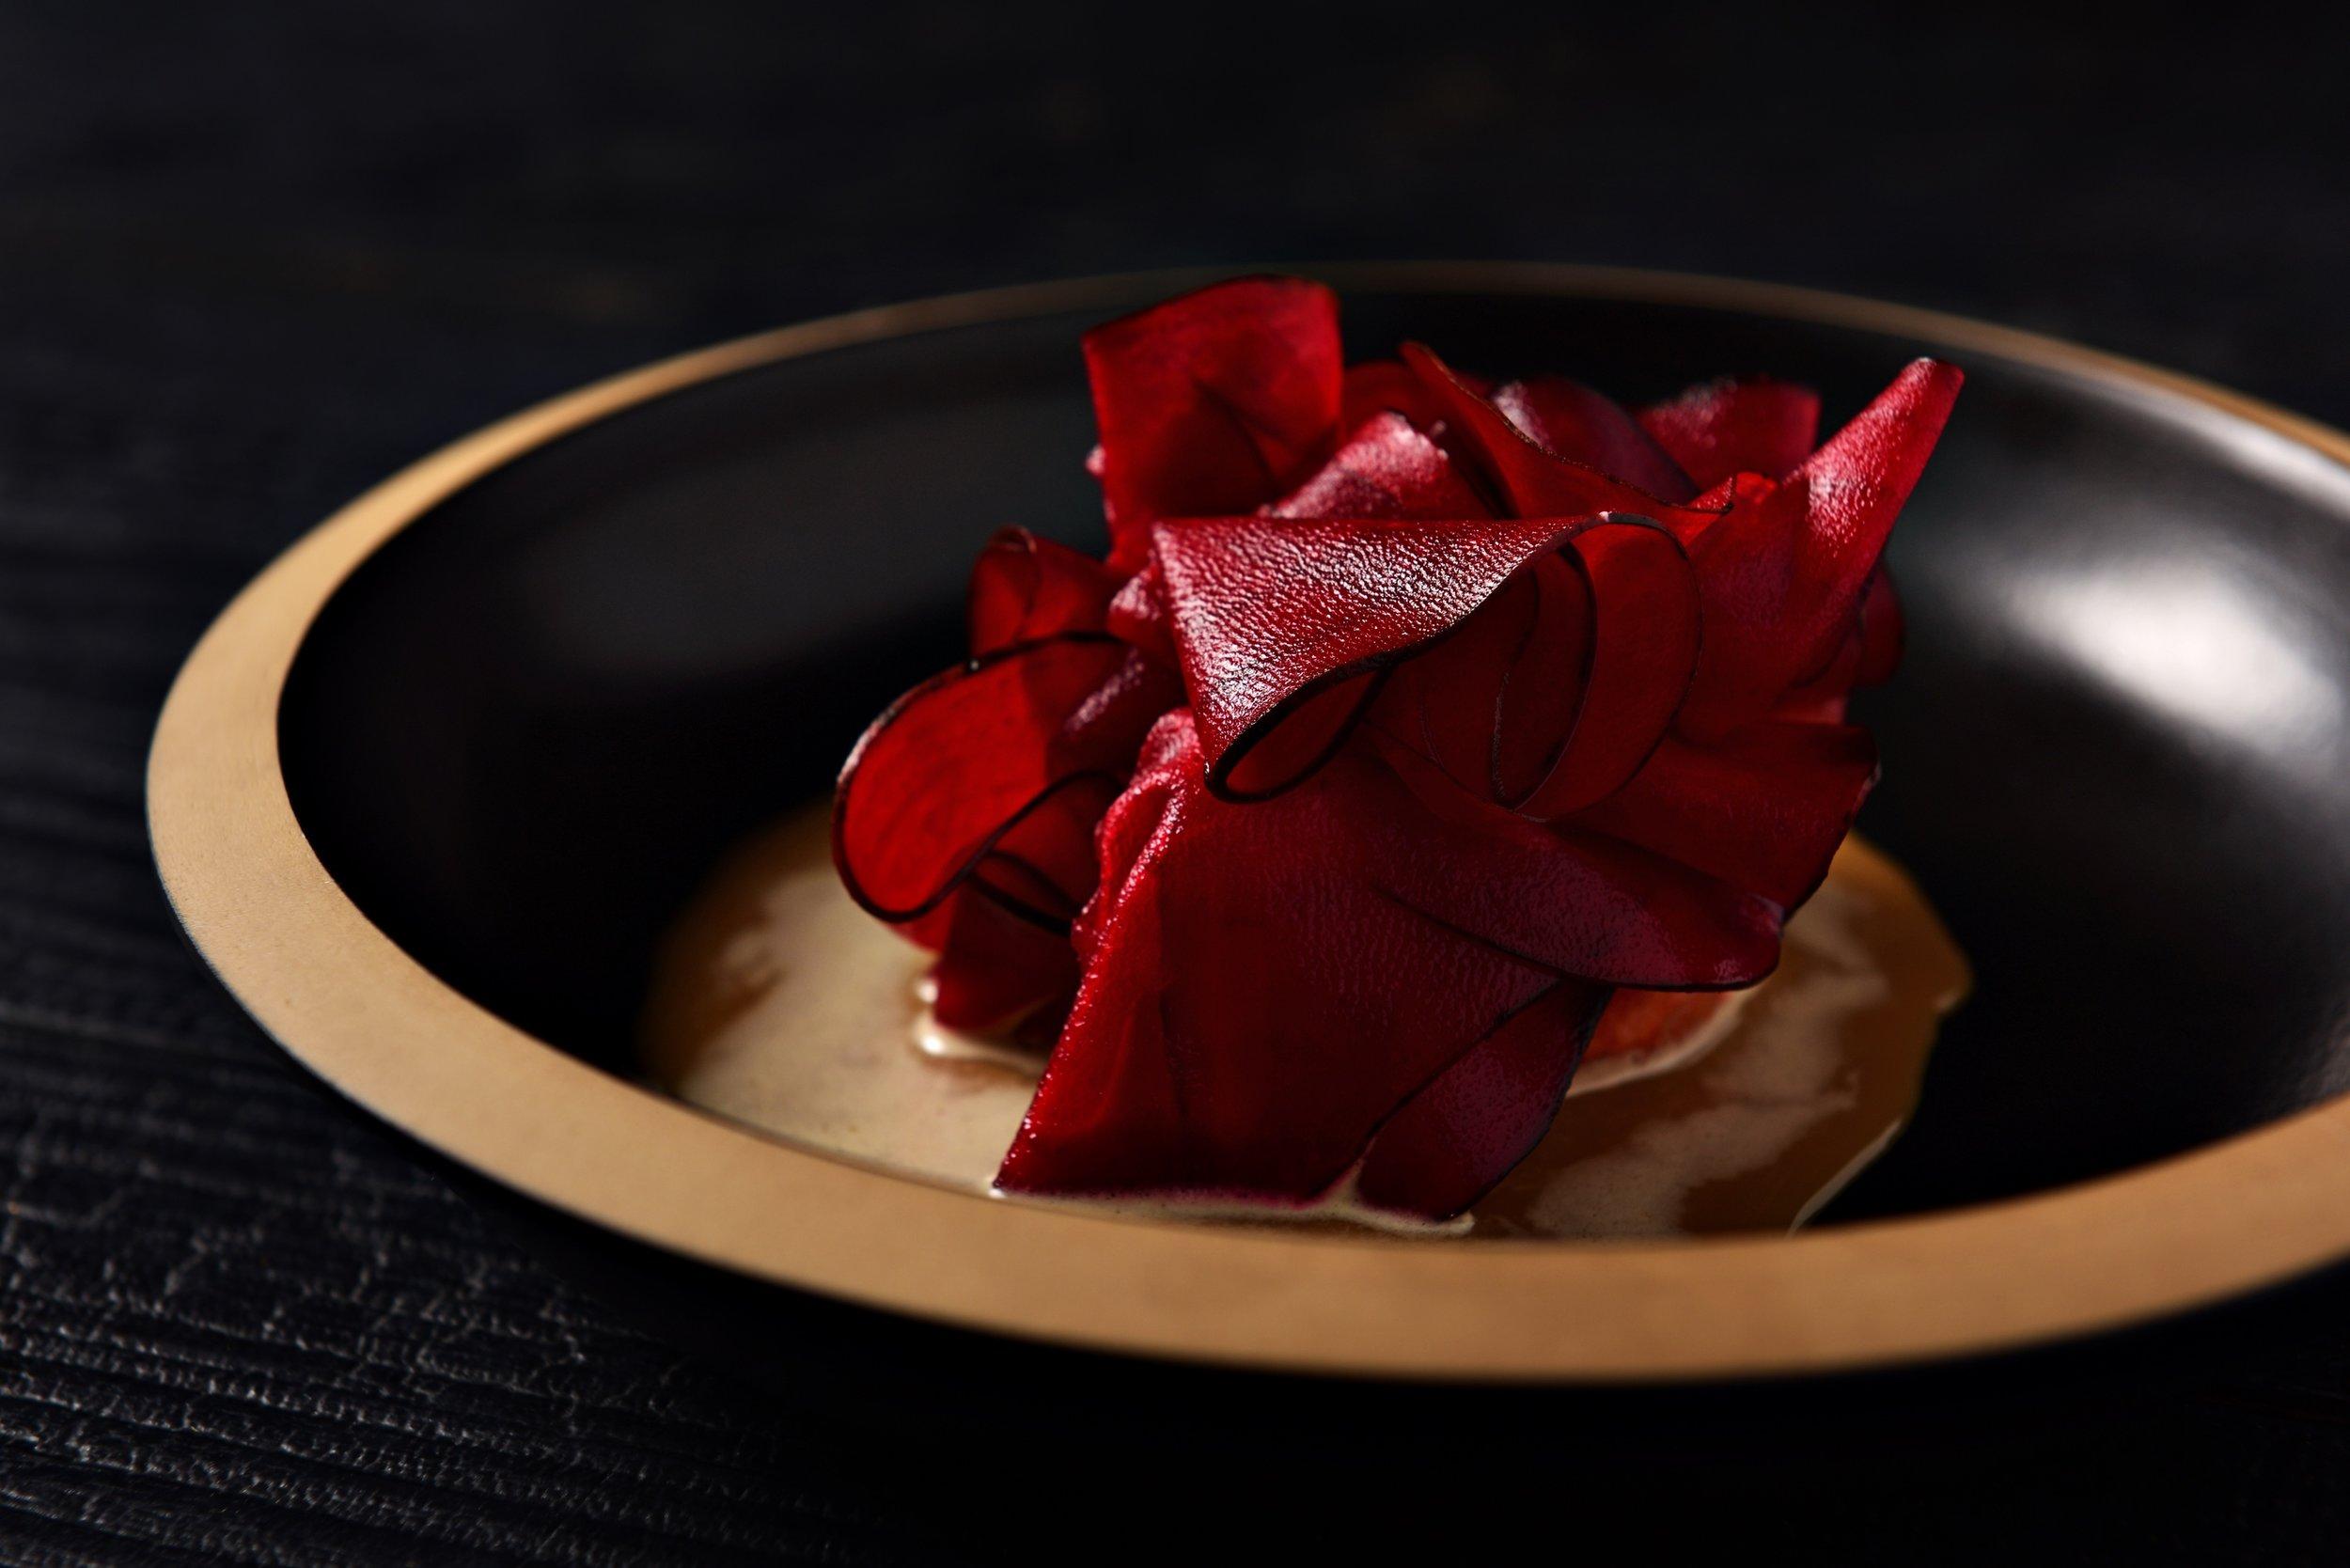 20 eed restaurant hertog jan leuven beste bart albrecht fotograaf food tablefever.jpg